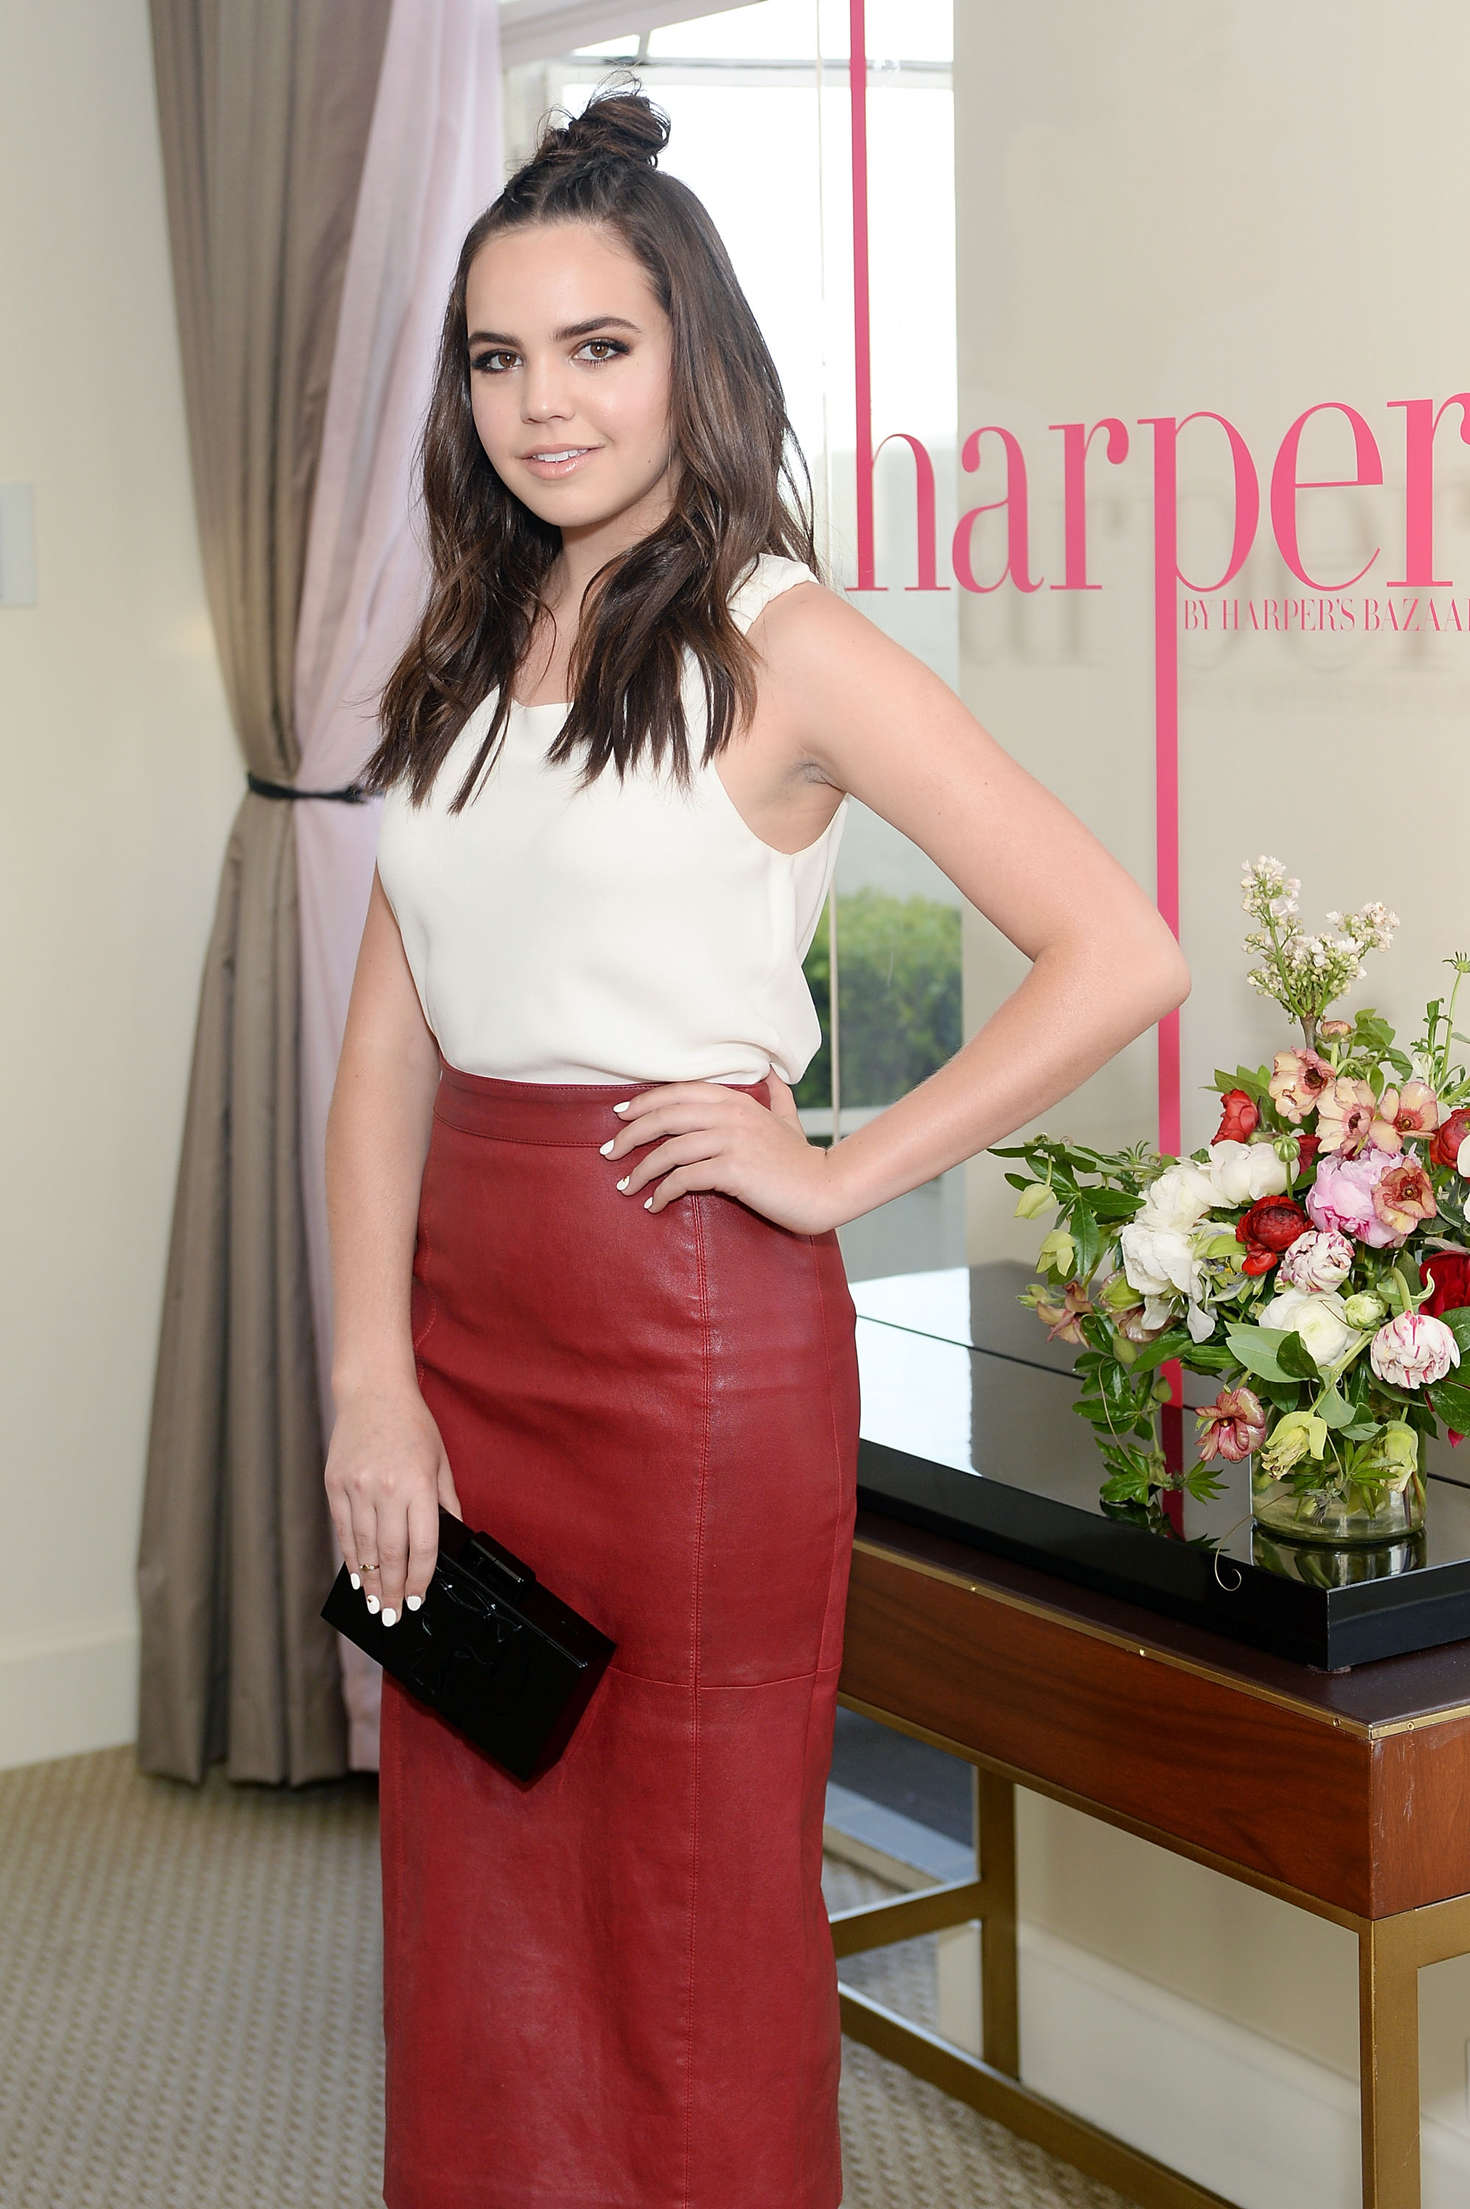 Bailee madison harper x harper s bazaar may issue event in west